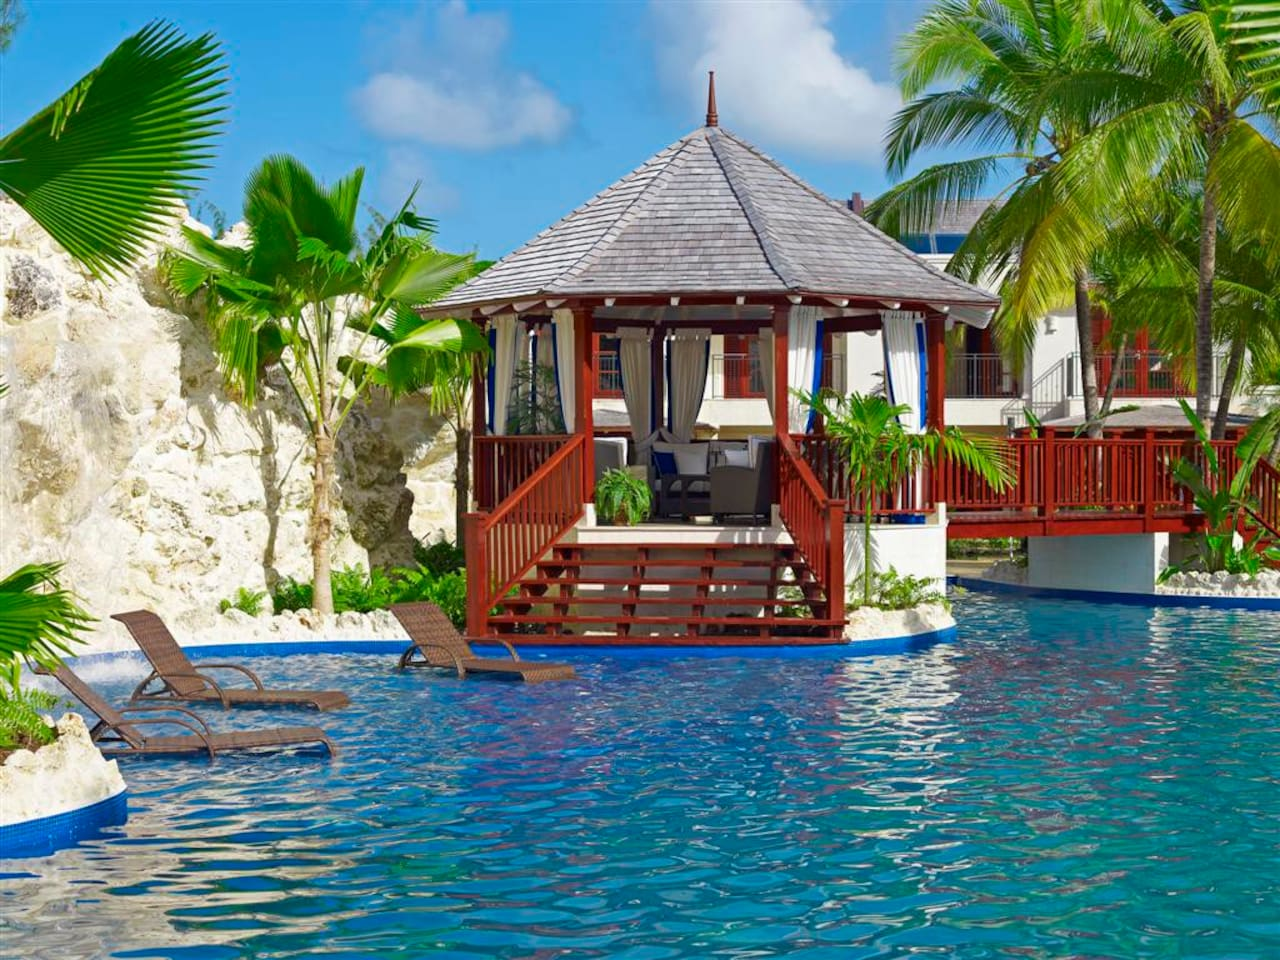 4000 sq ft pool, with communal gazebo and waterfall.